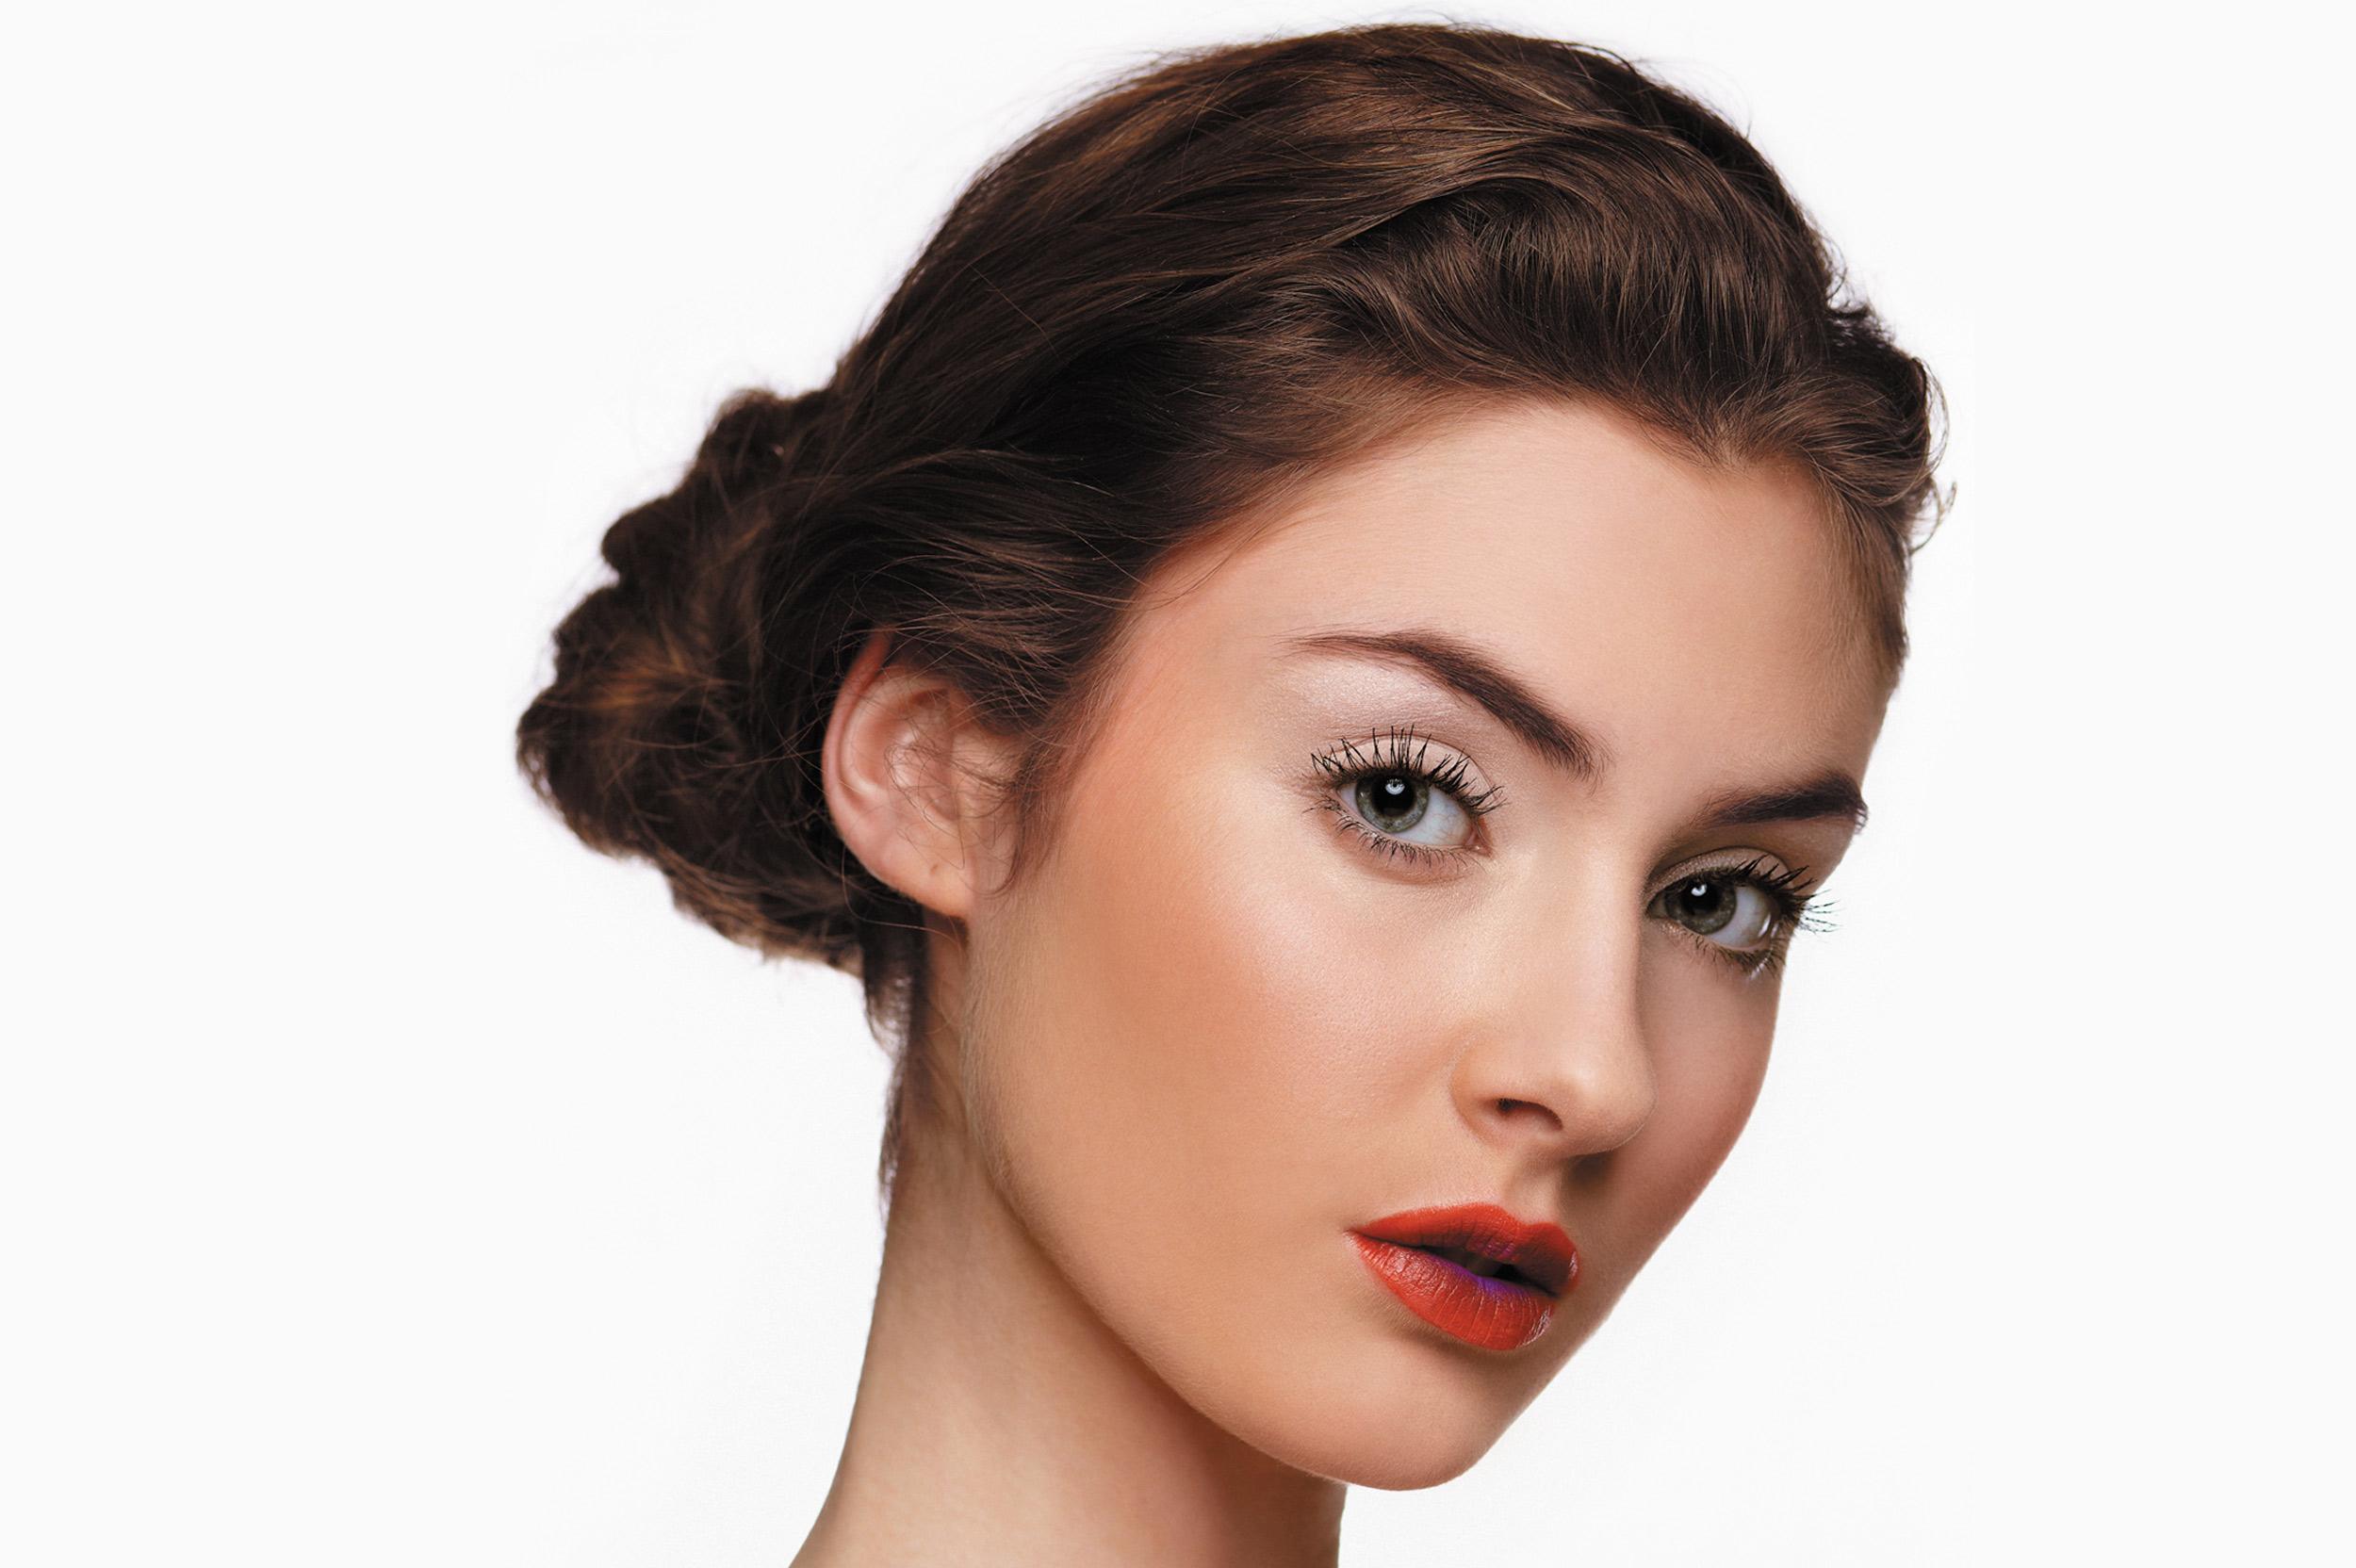 photo by  Jennifer Dickinson  | hair by Eriko Y at  I'z Hair Studio  | model Anya Policnick